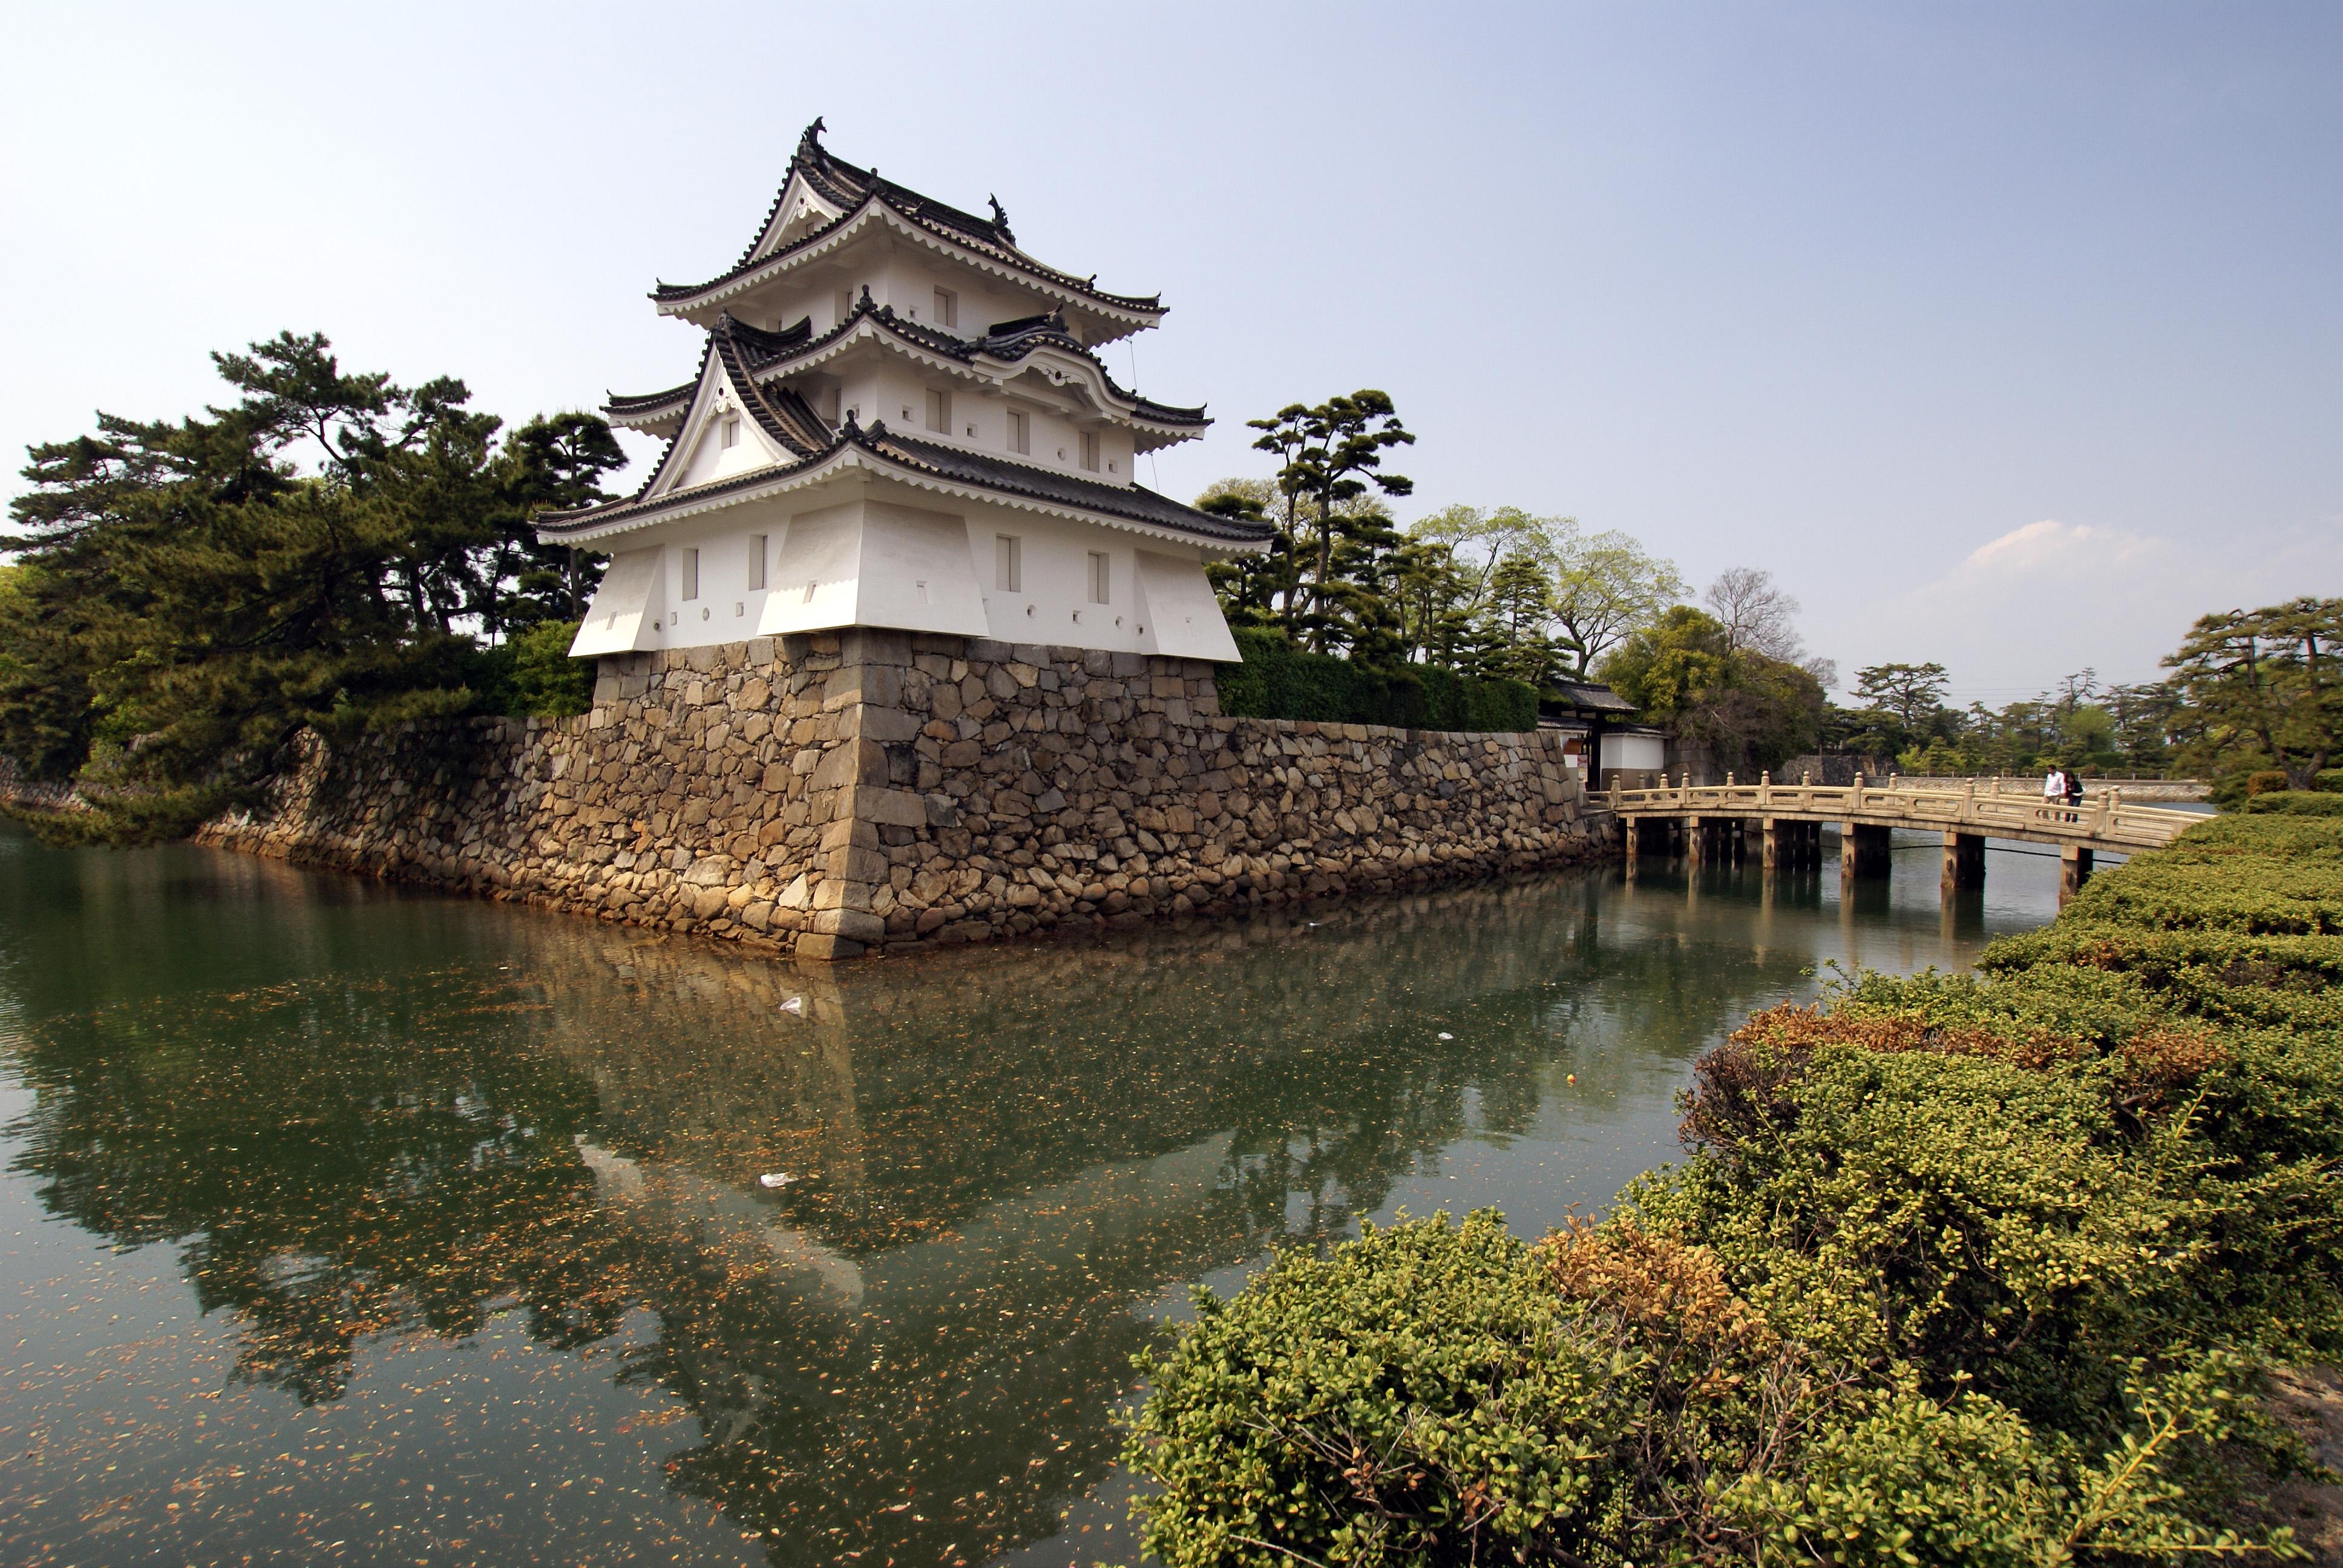 Takamatsu Japan  city pictures gallery : 日本のお城の構造名称についての質問です。 ・櫓の ...